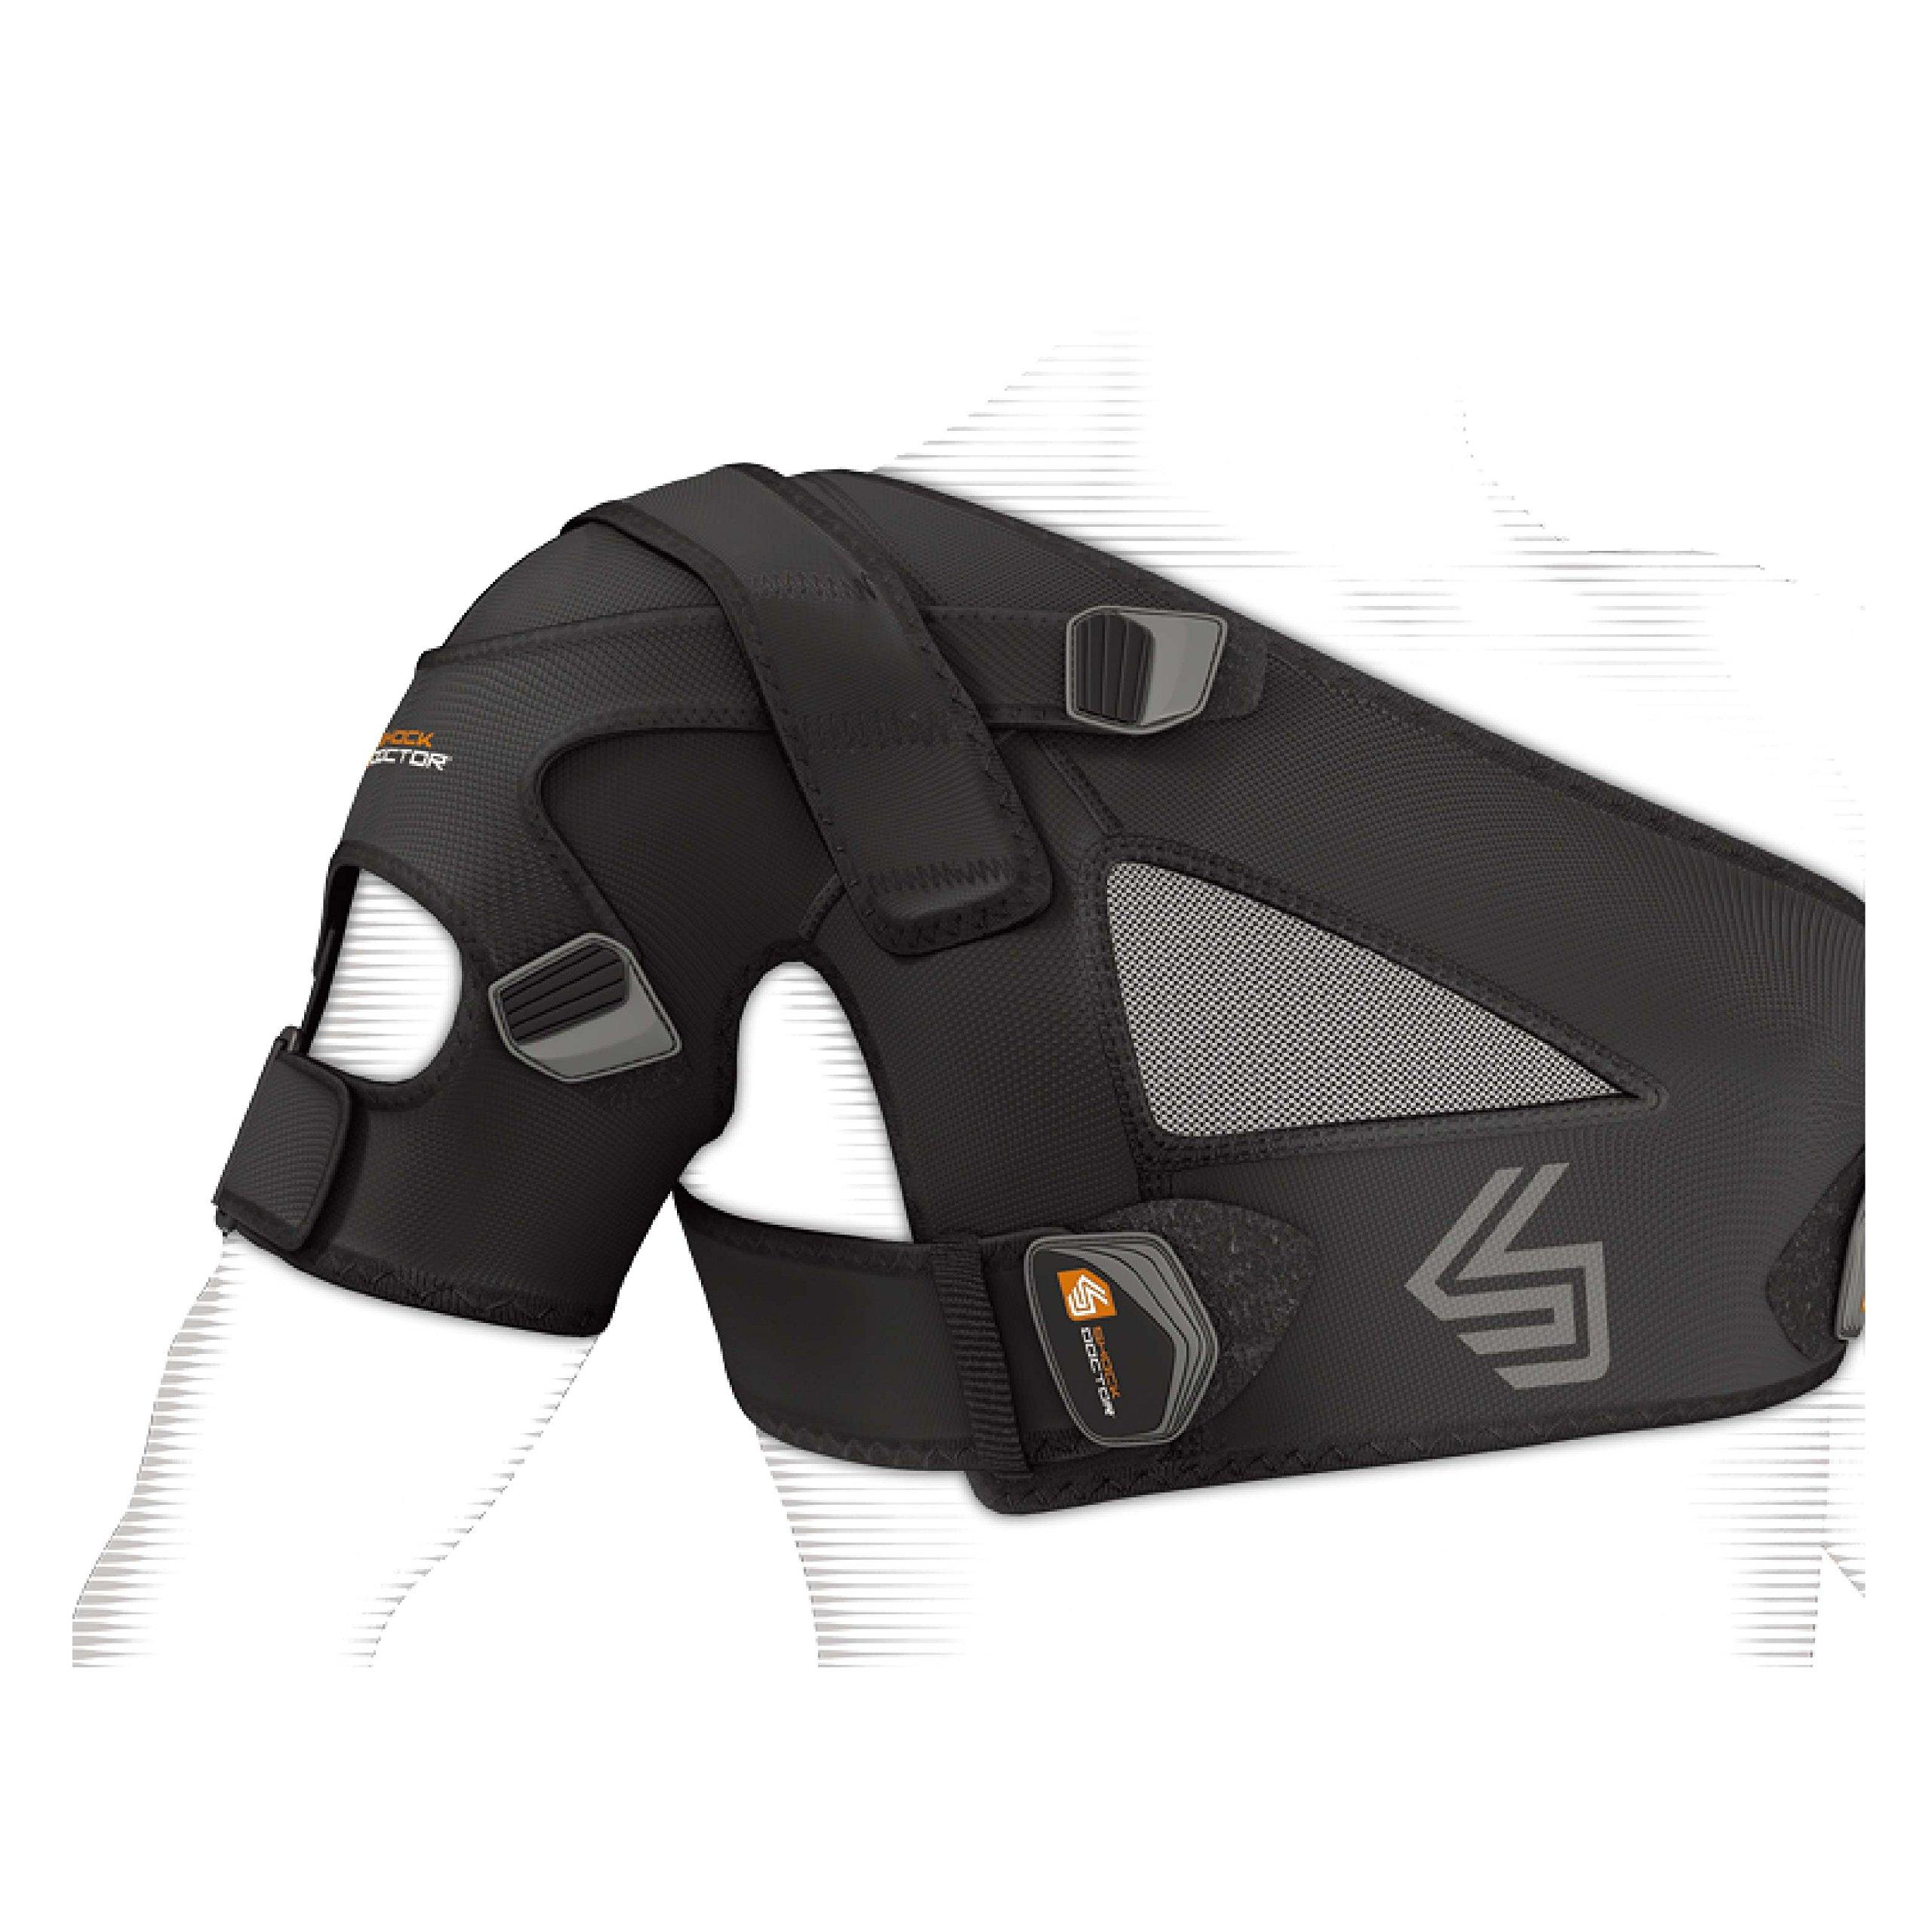 Shock Doctor Shoulder Support (Black, X-Small)